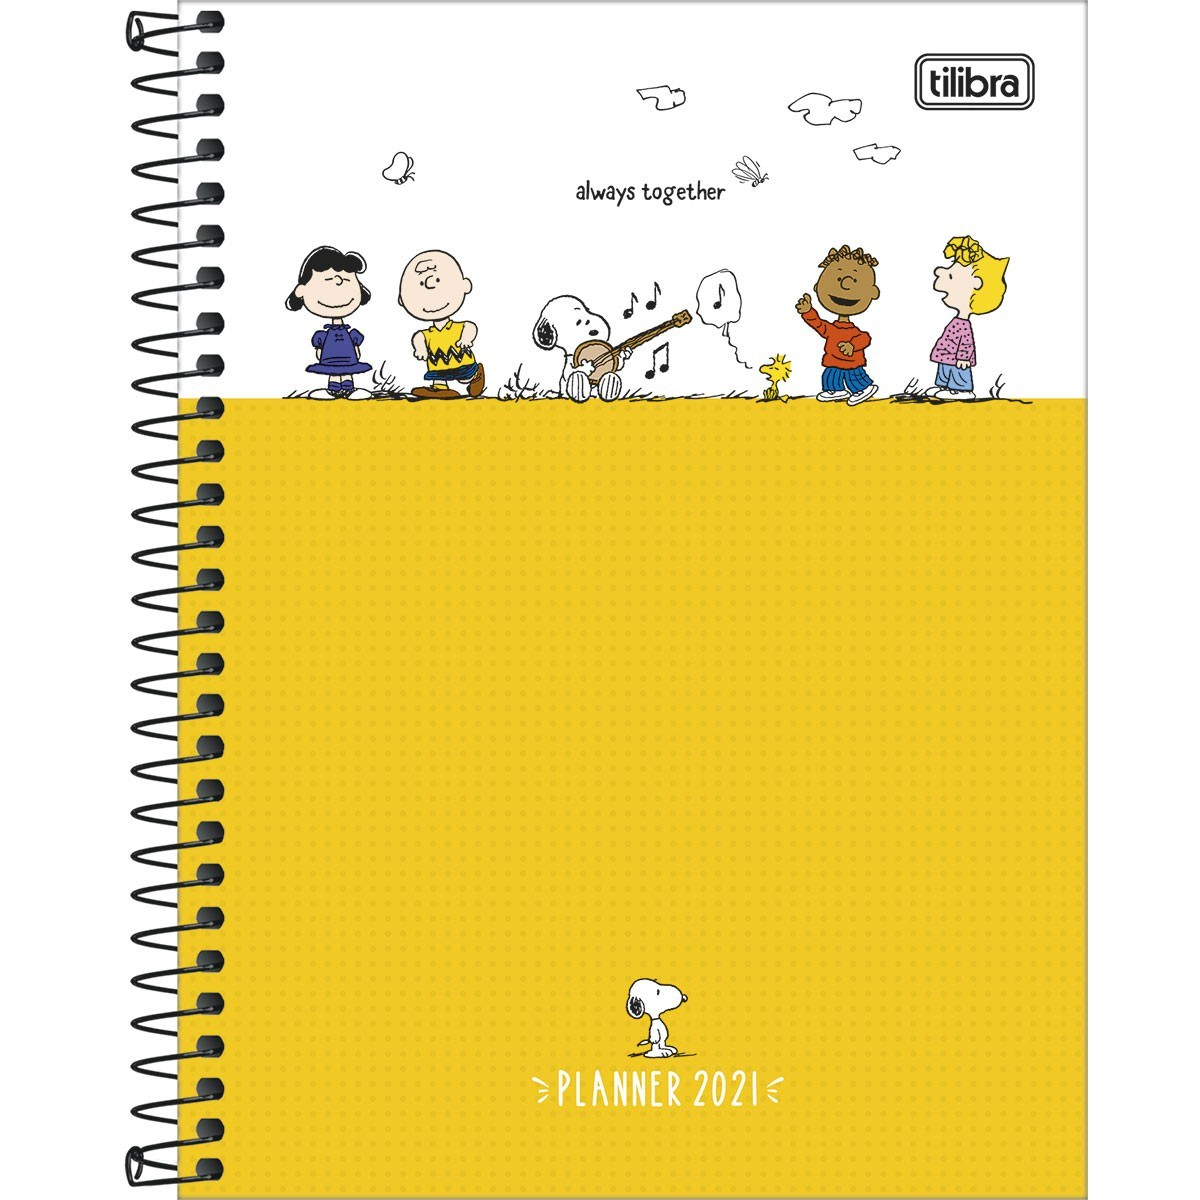 Agenda Planner Espiral Snoopy 2021 - Tilibra